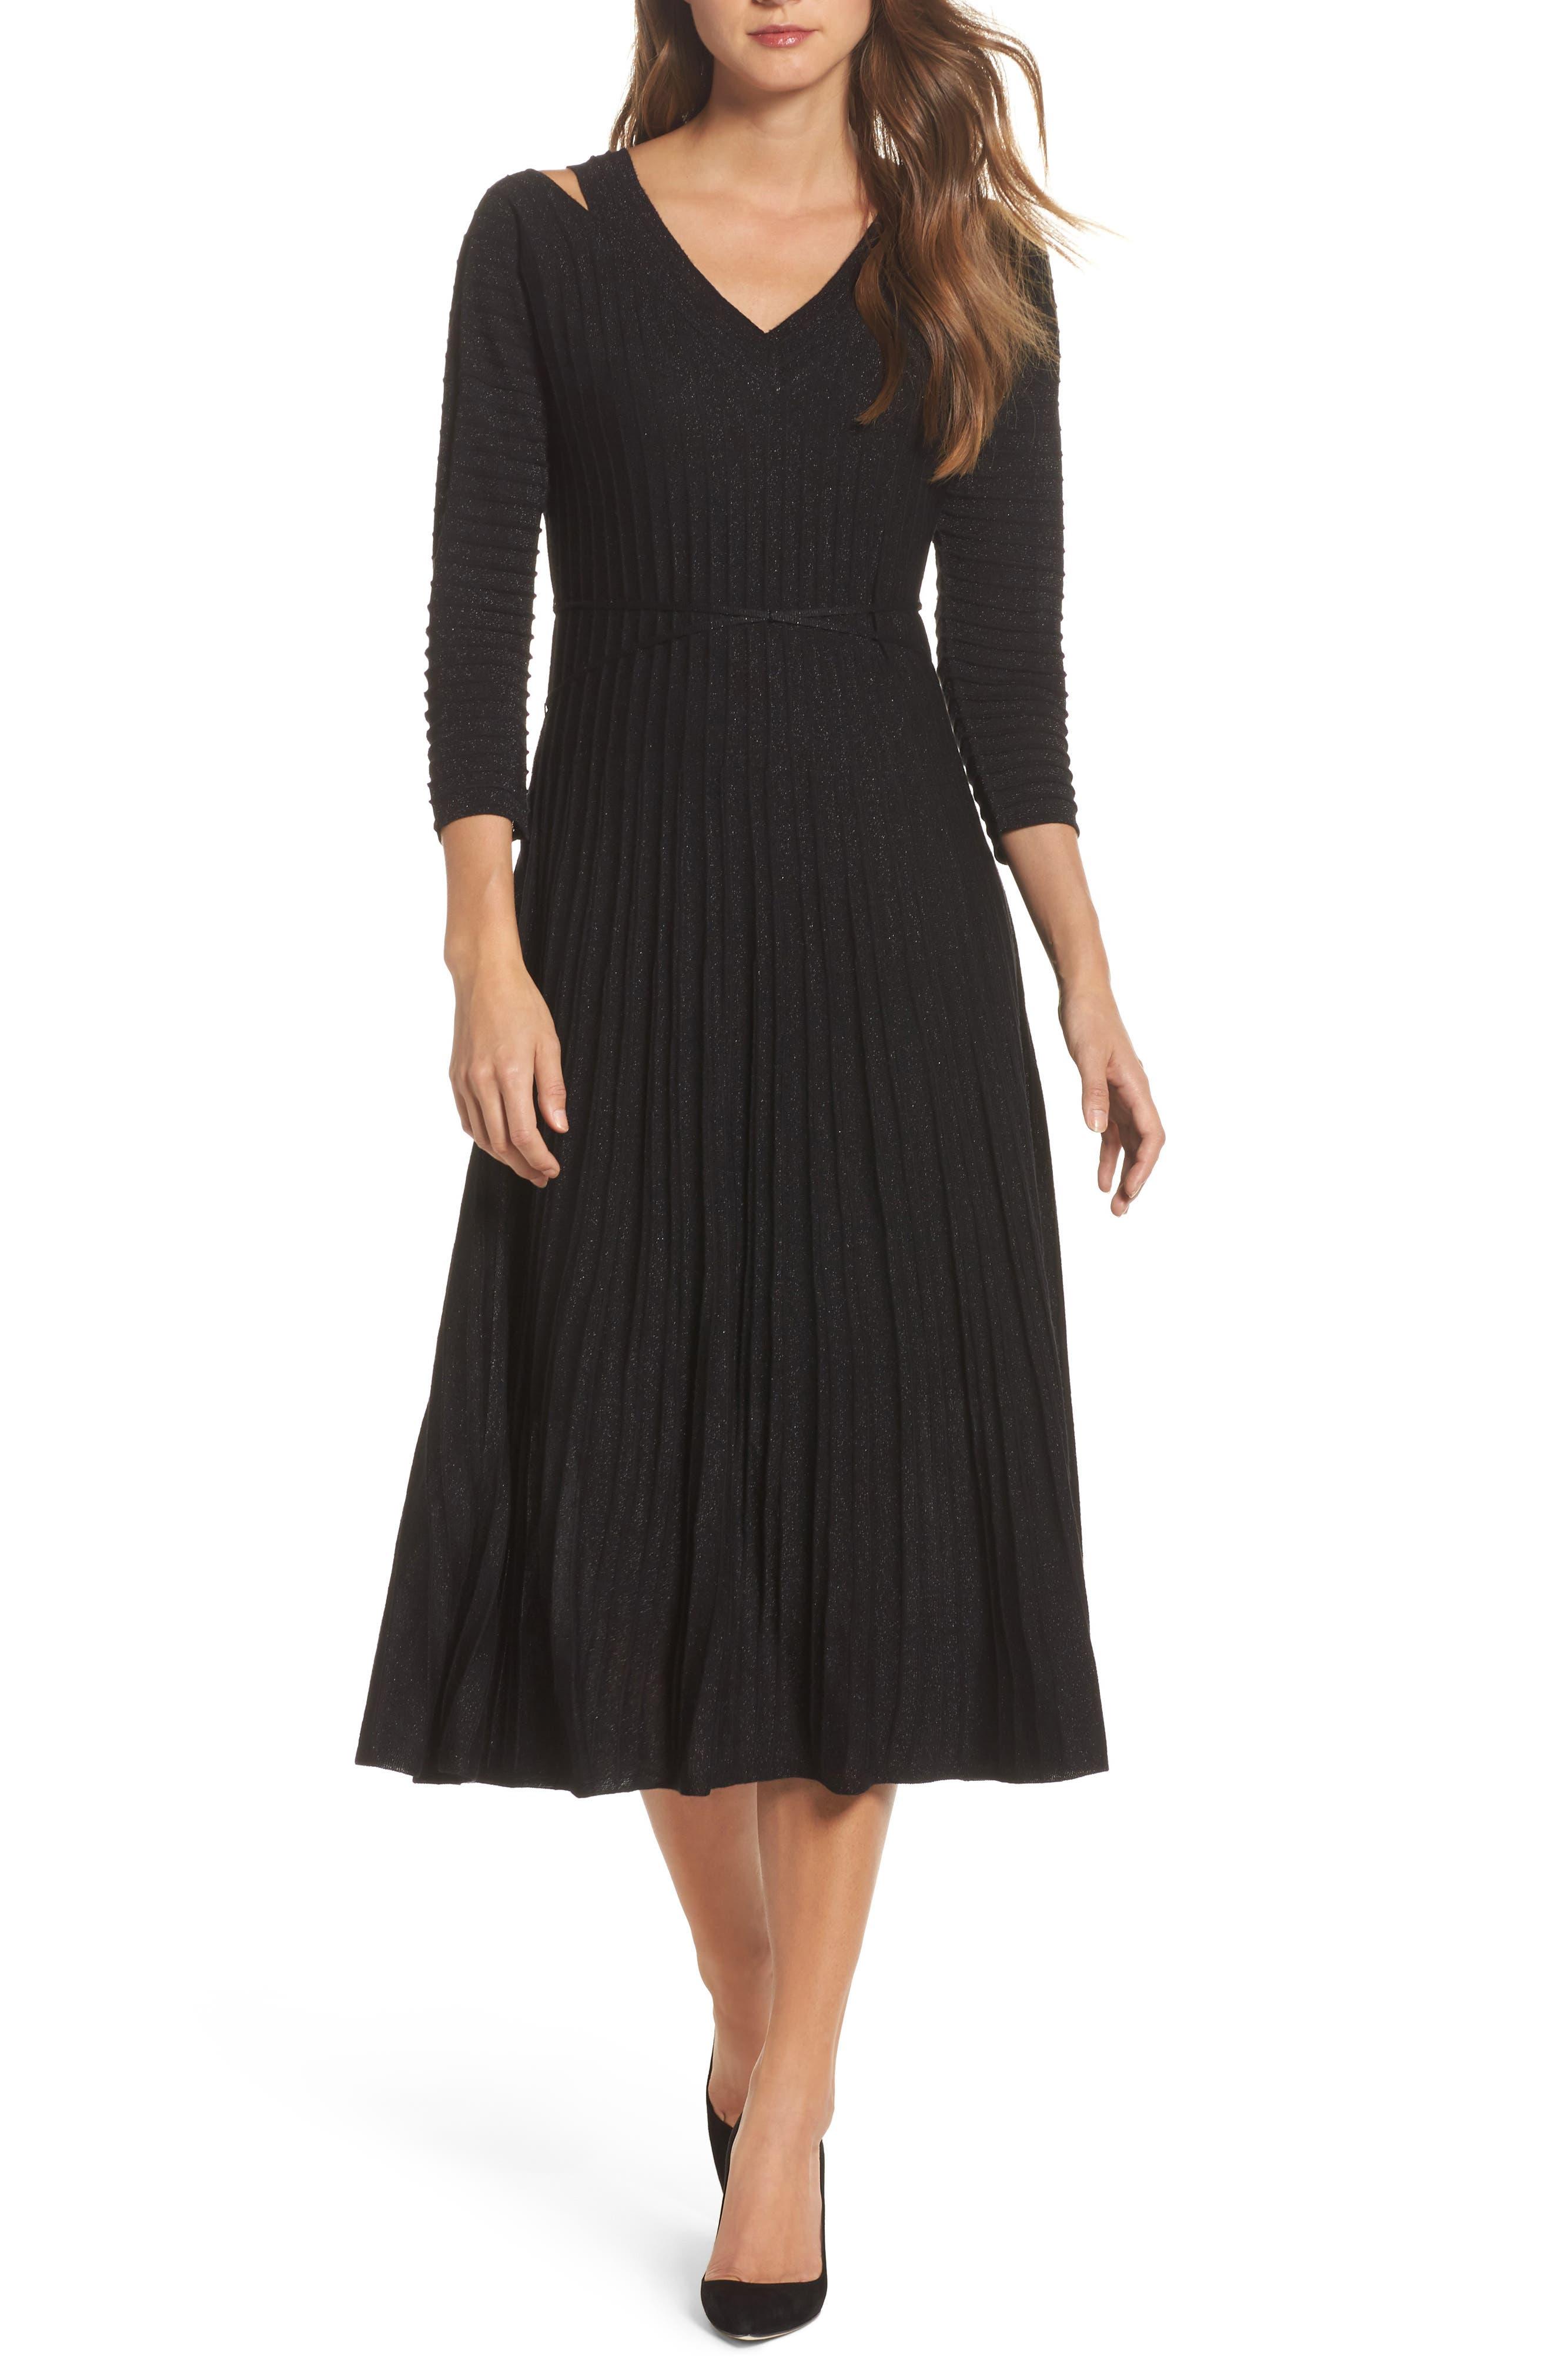 NIC + ZOE Shimmer Pleats Dress,                             Main thumbnail 1, color,                             Metallic B